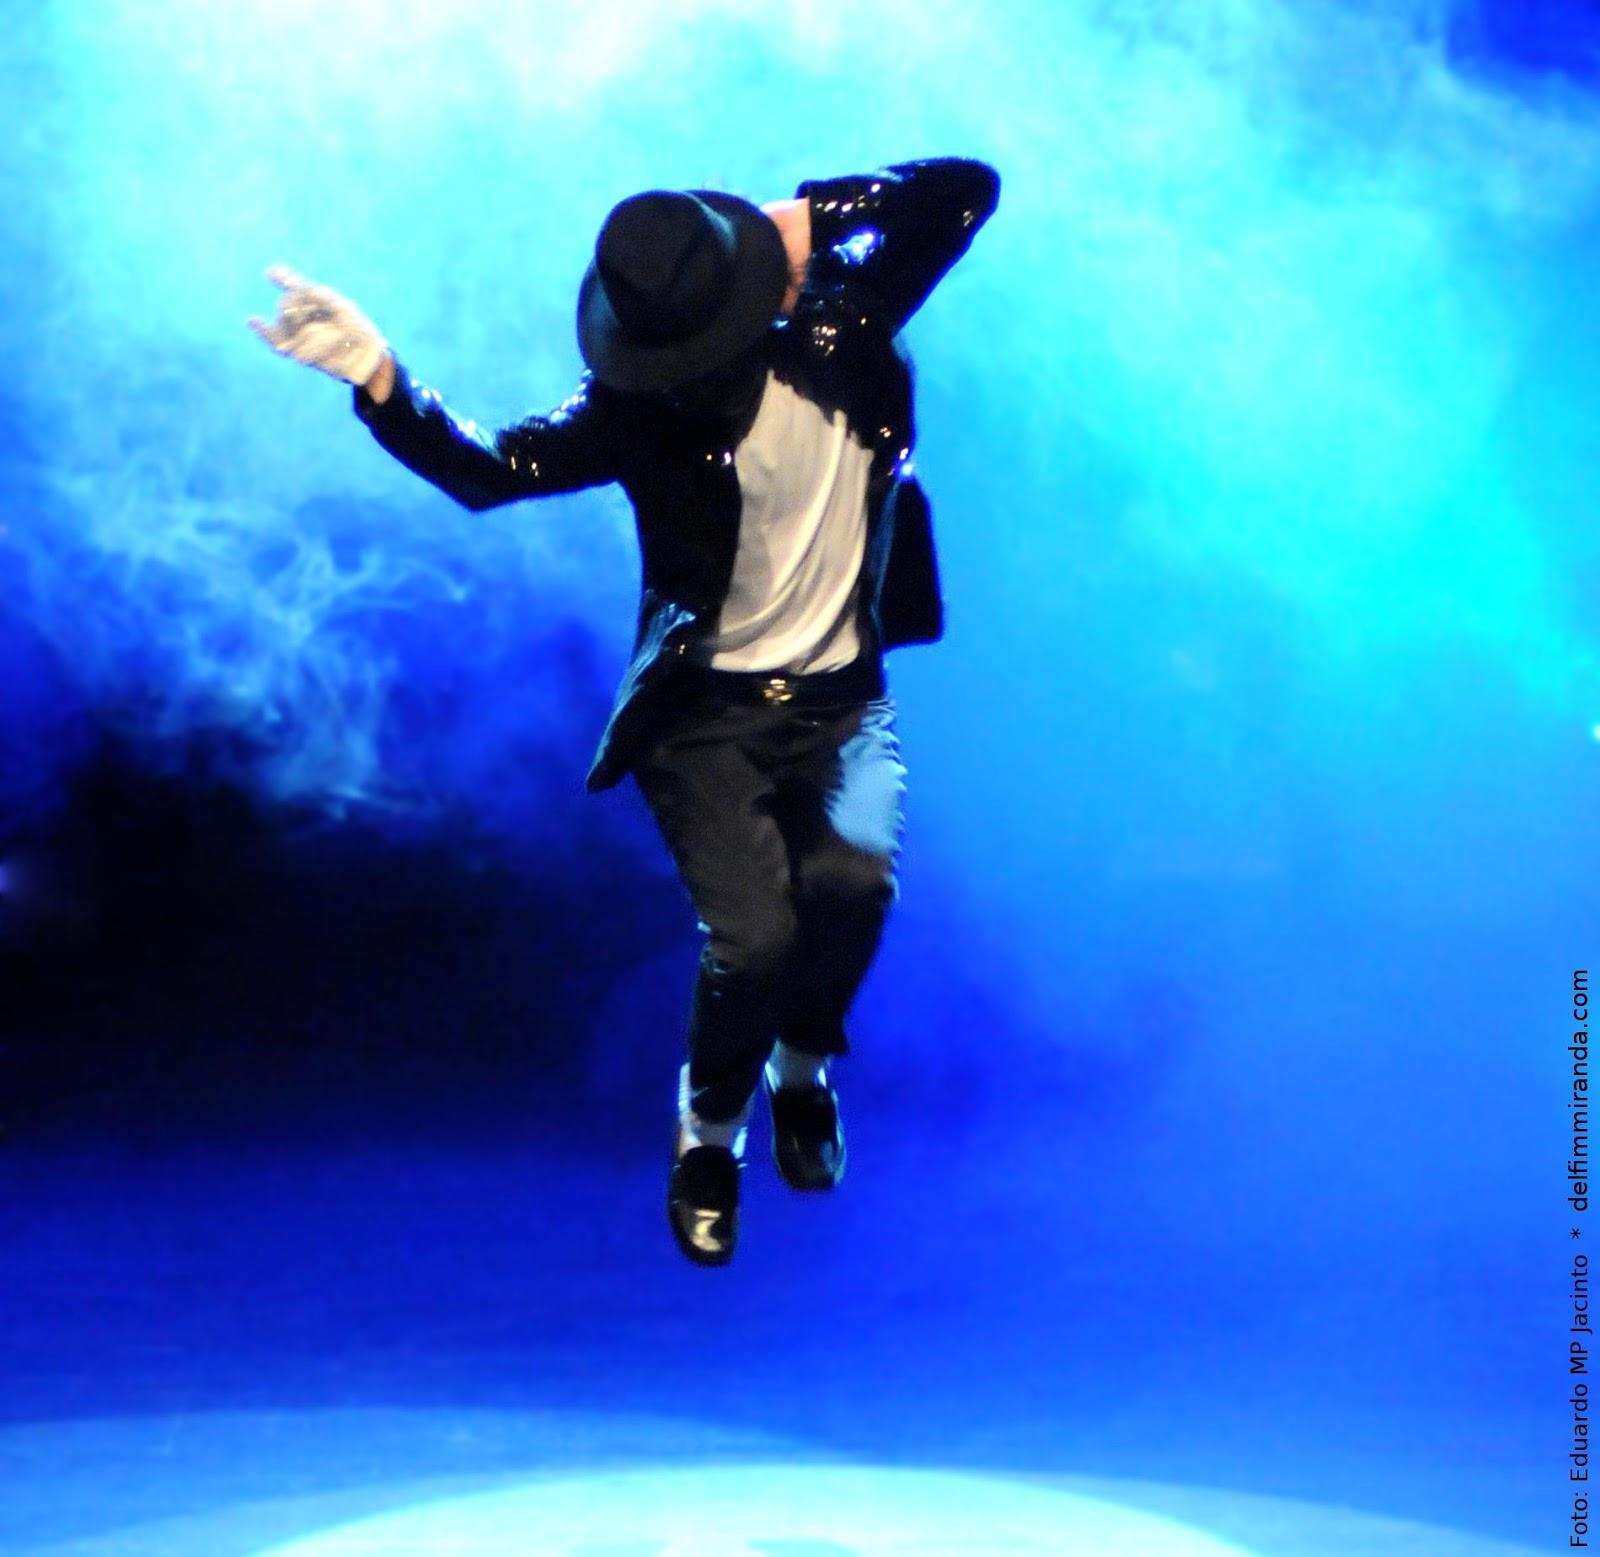 Delfim Miranda - Michael Jackson Tribute - Billie Jean - Jump